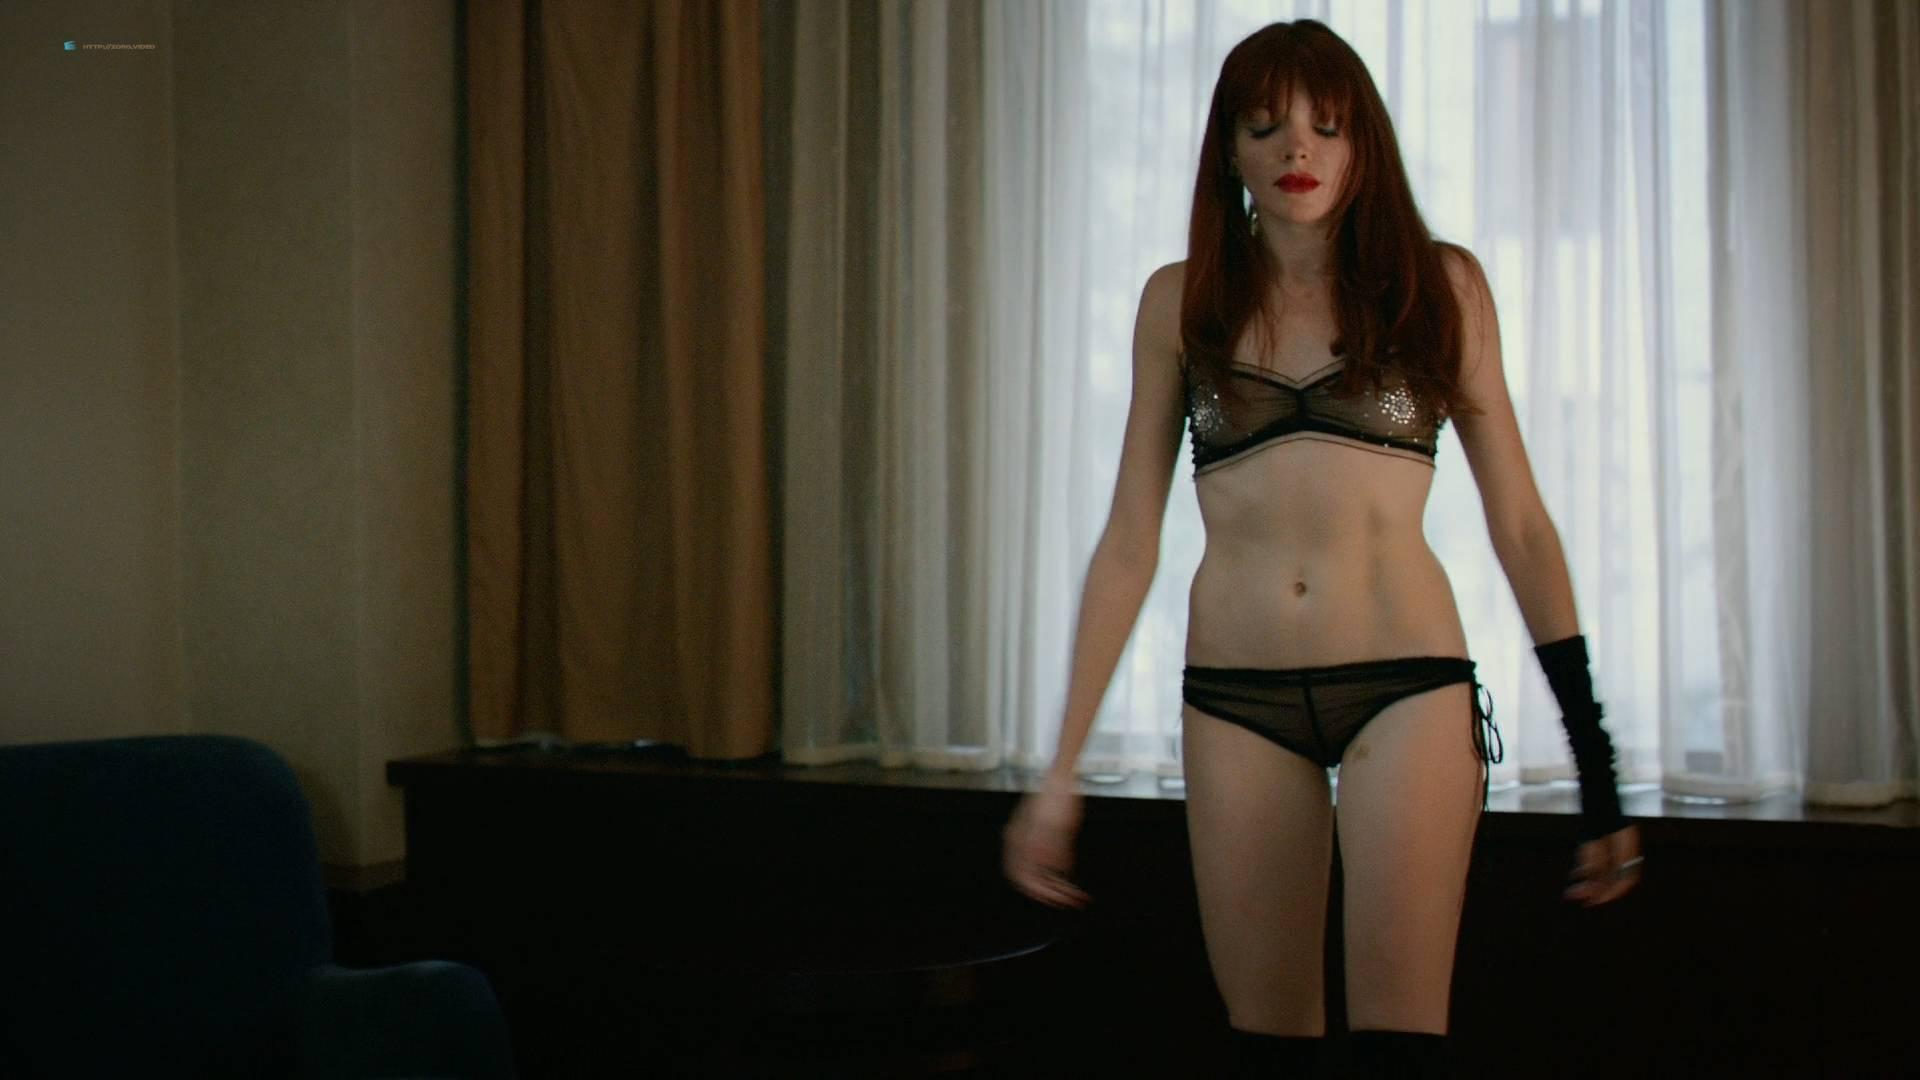 Nicole LaLiberte nude full frontal - Girls Against Boys (2013) HD 1080p BluRay (11)